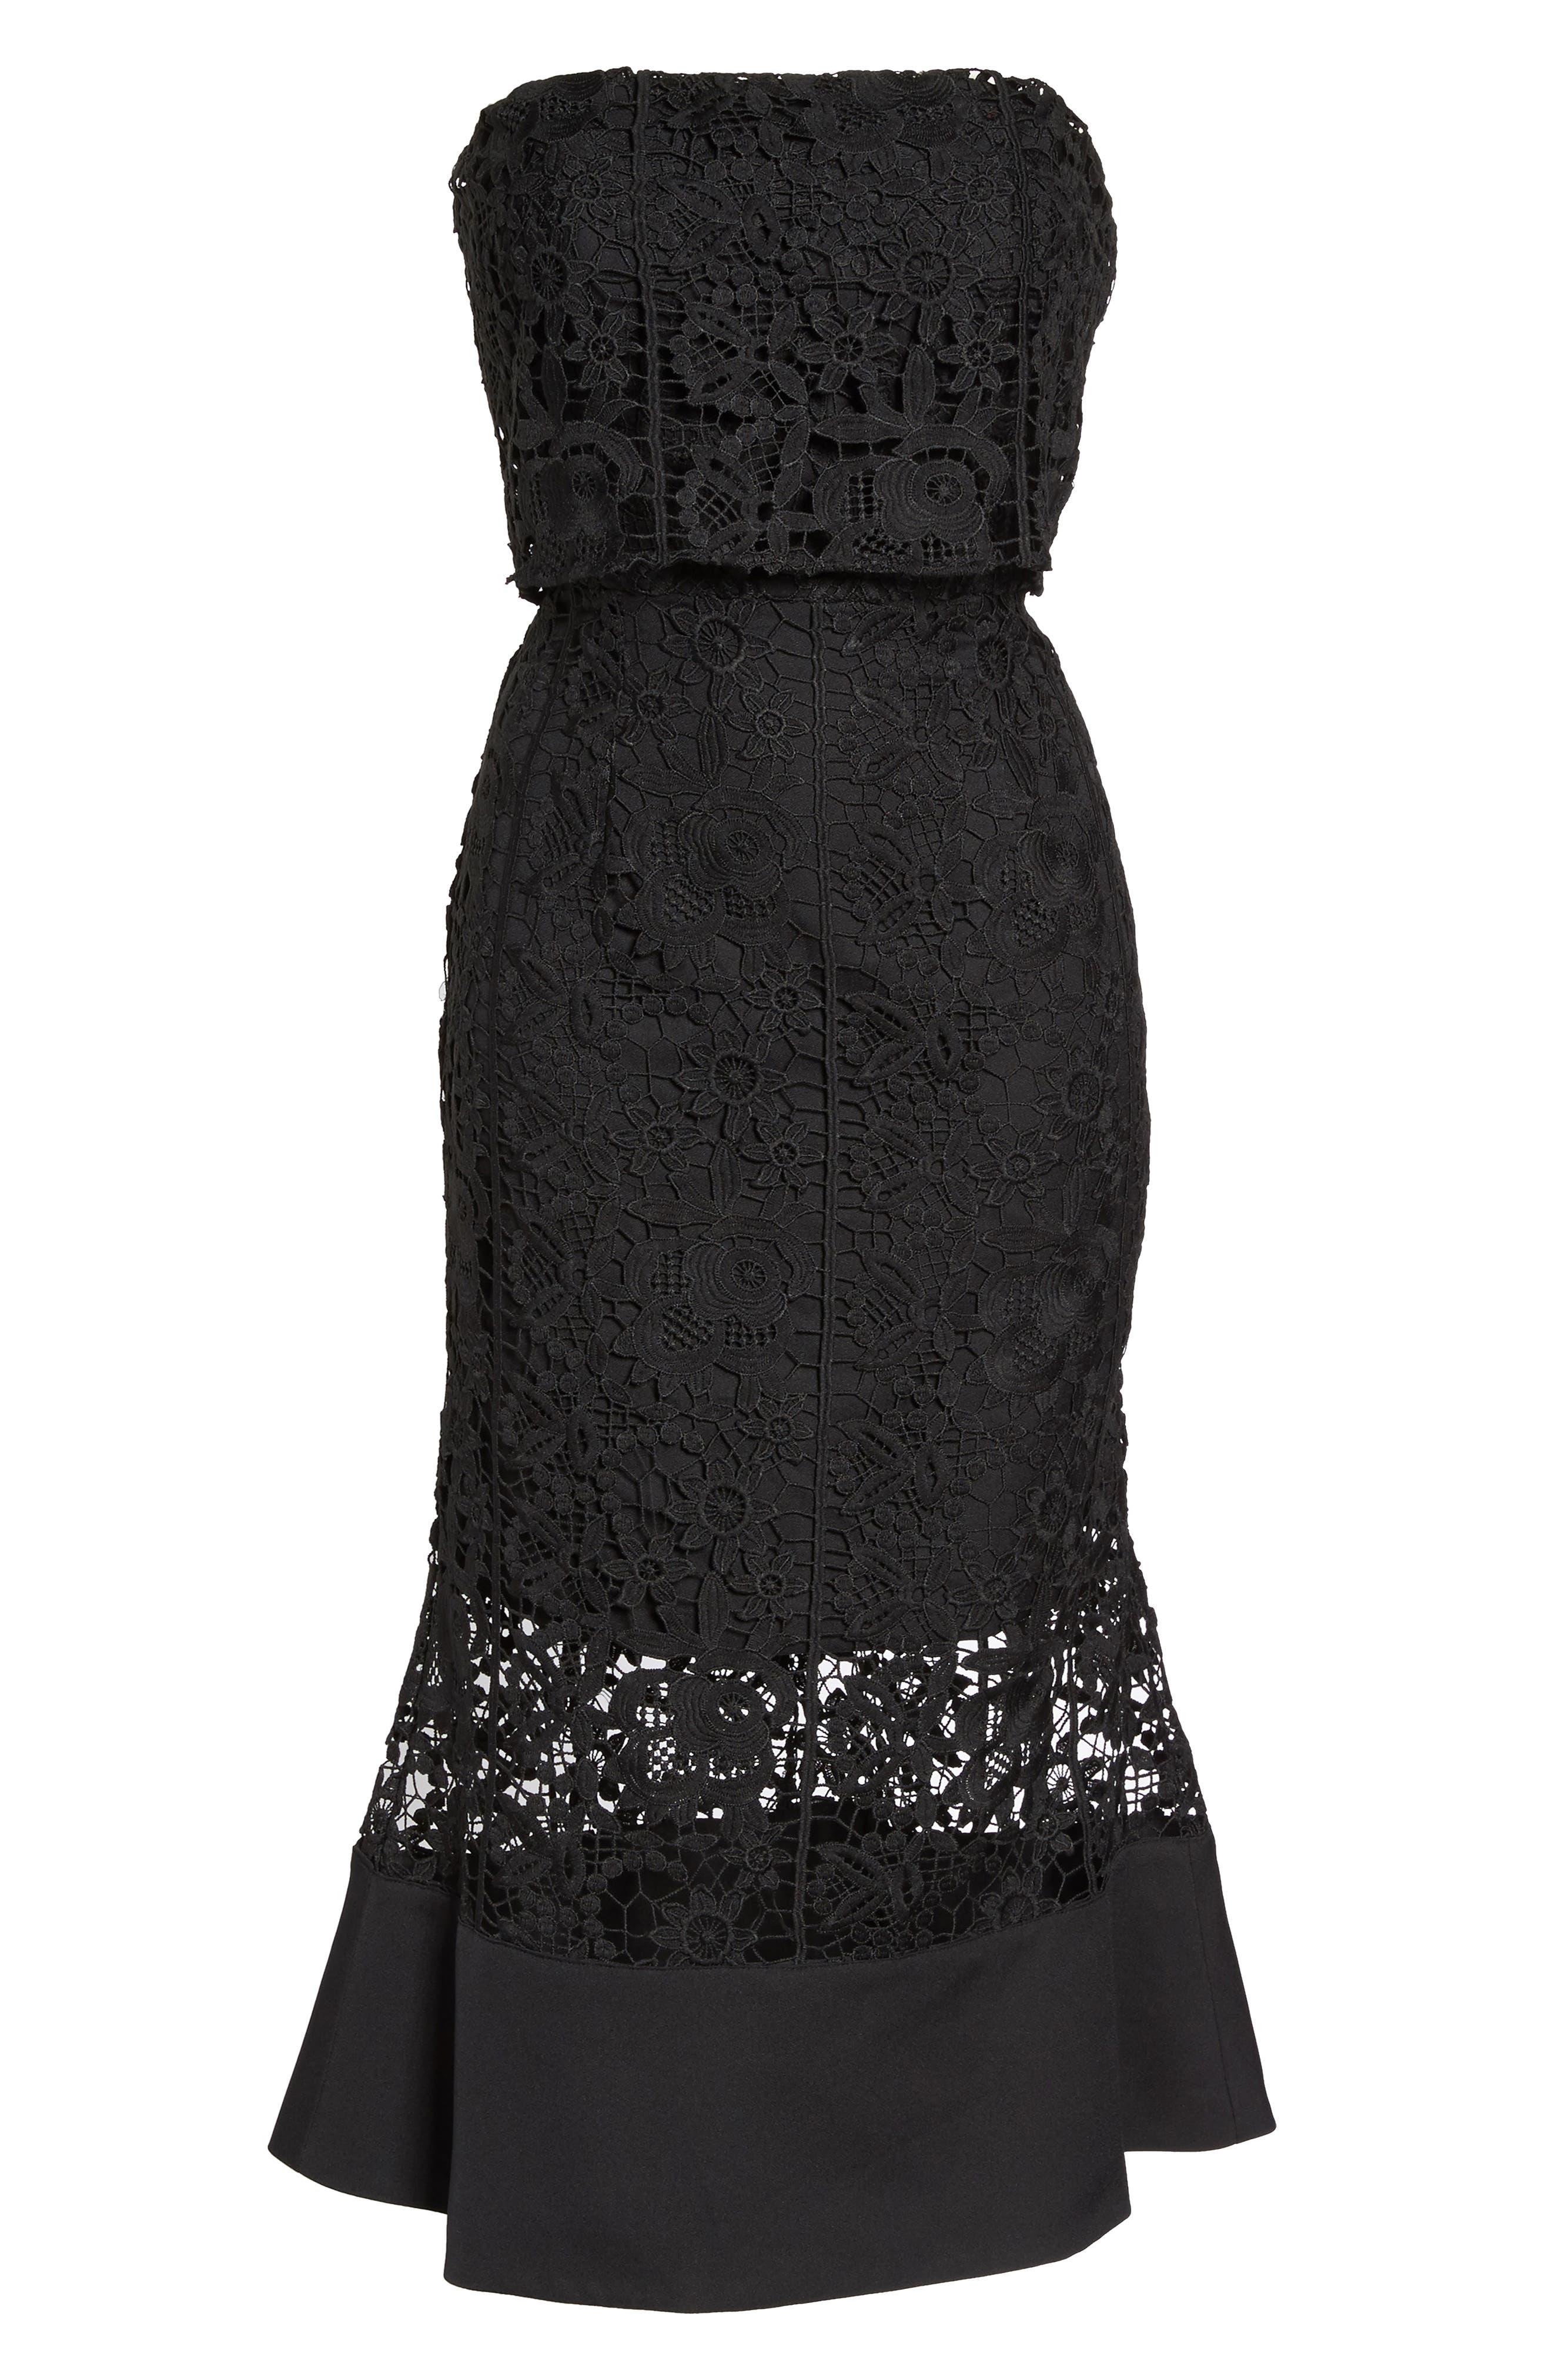 Xenia Strapless Lace Midi Dress,                             Alternate thumbnail 6, color,                             001